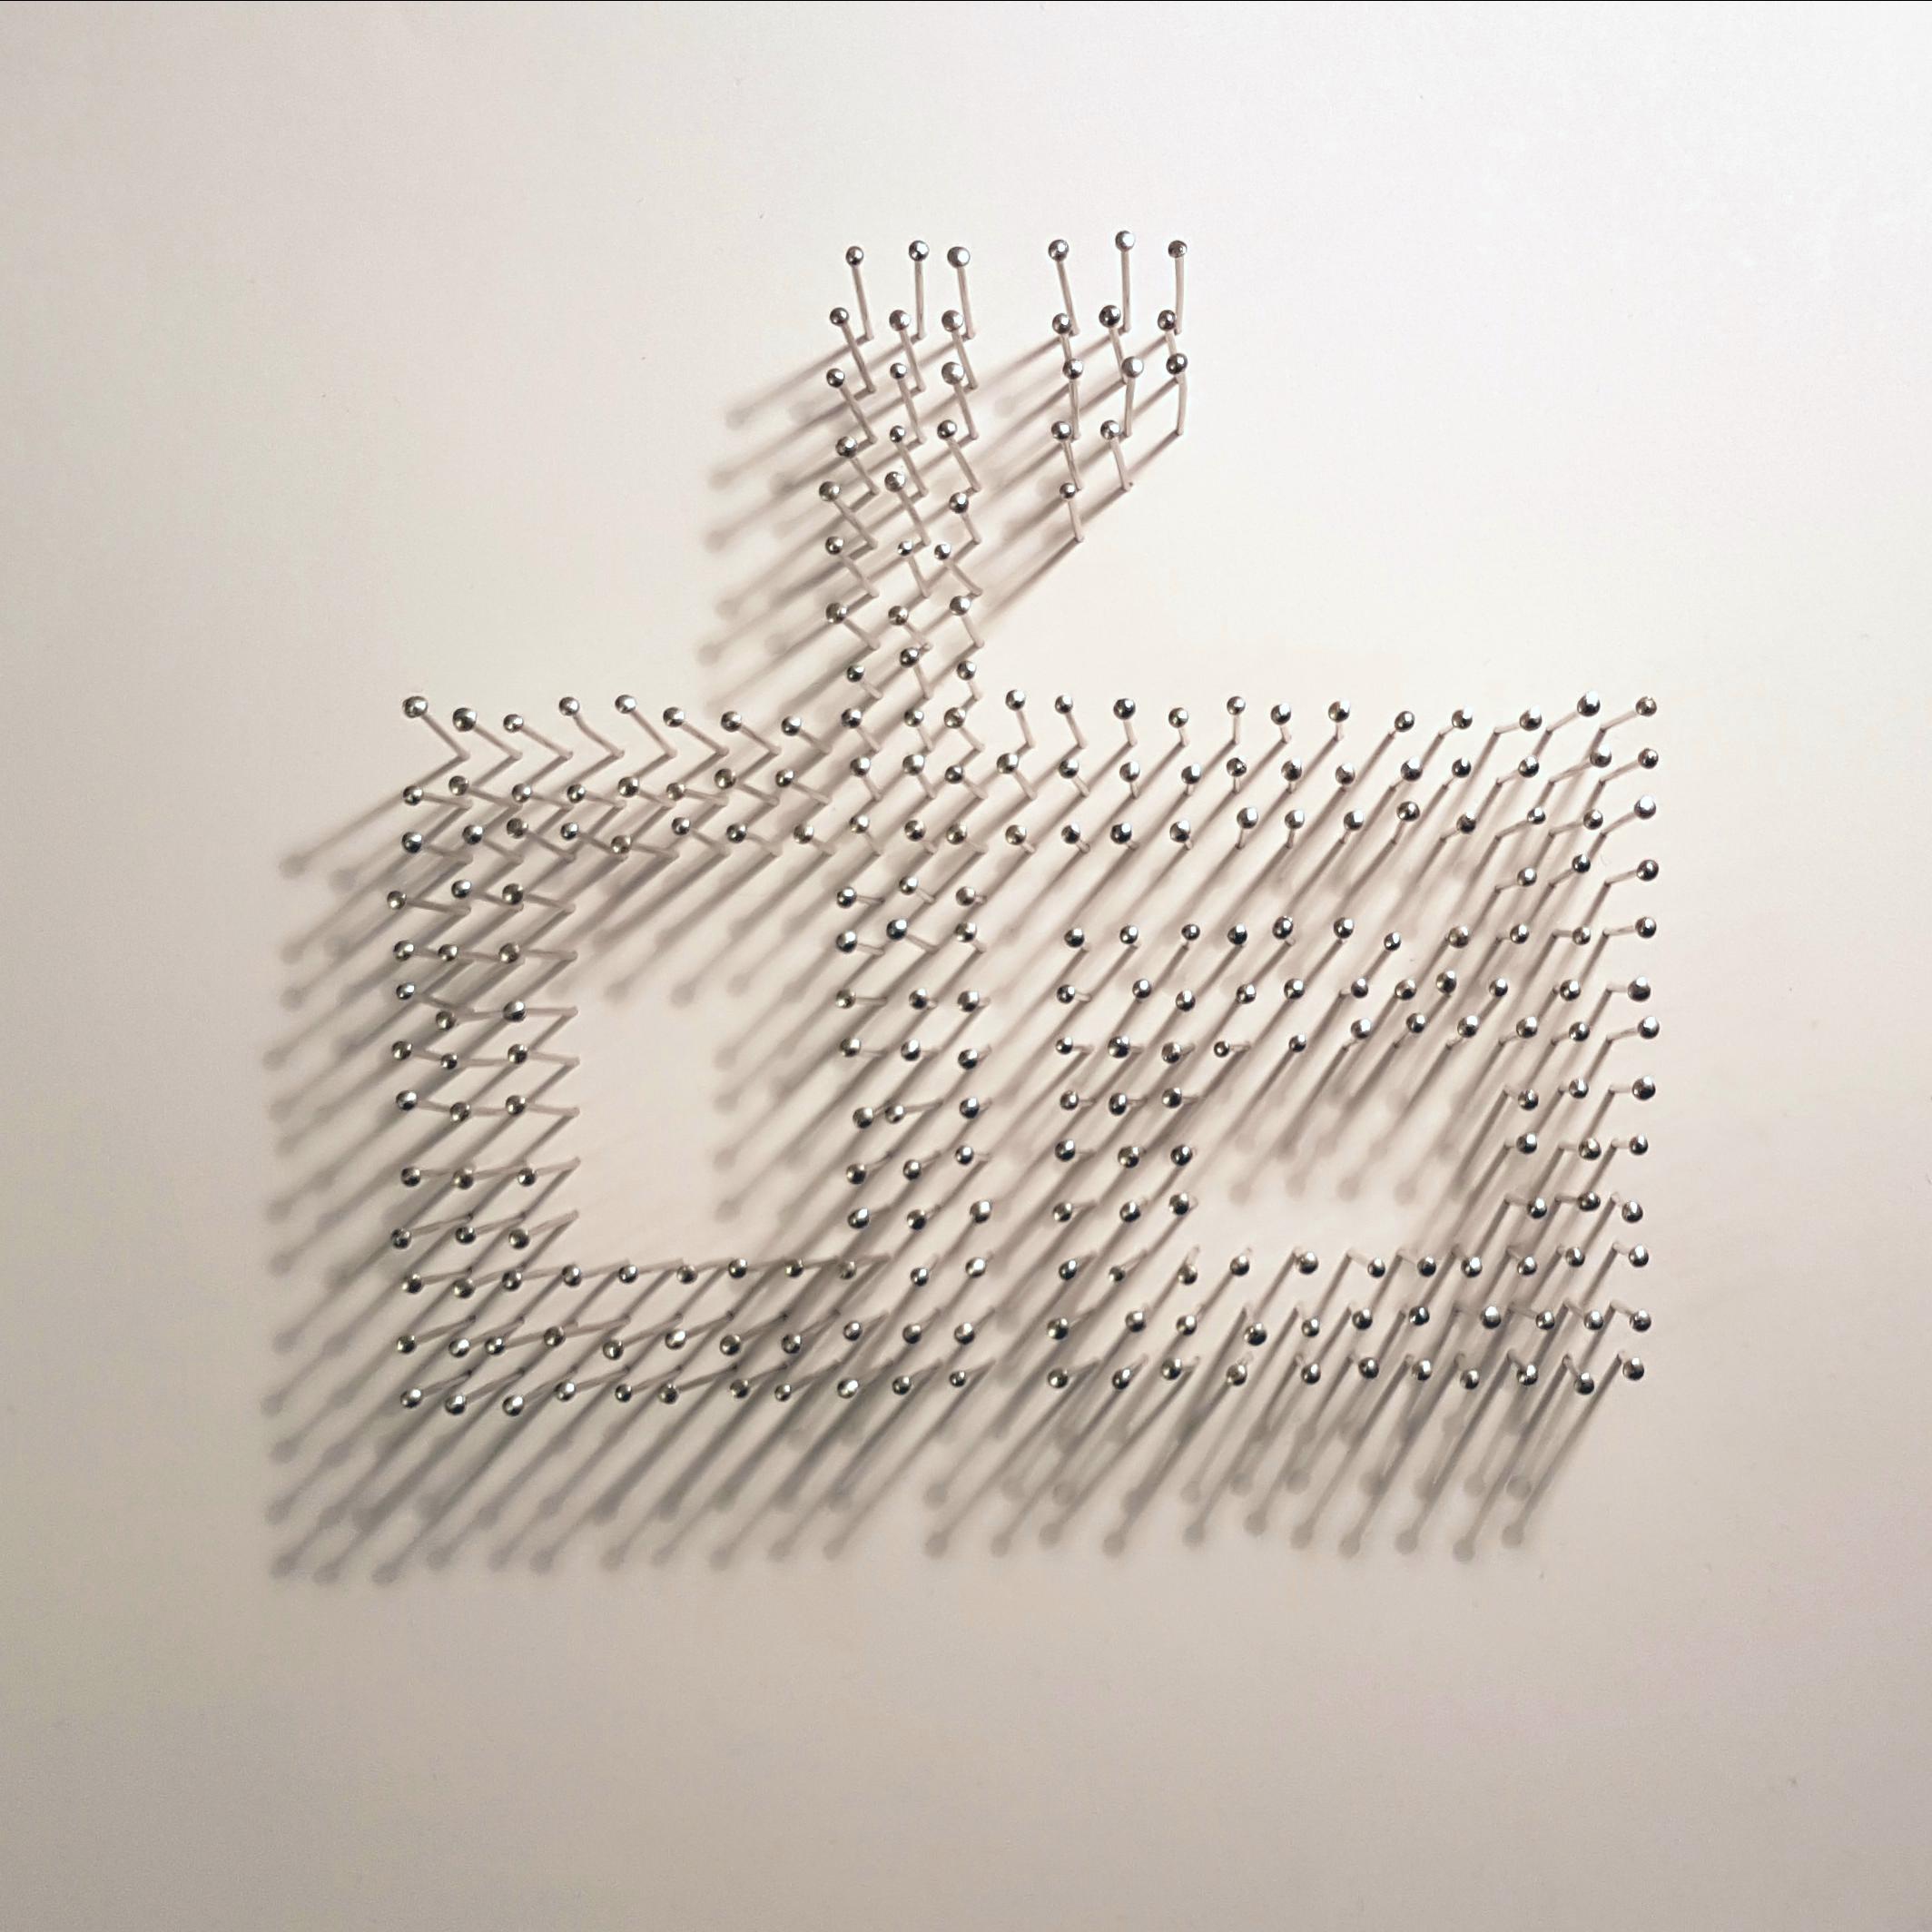 004dangeloweb - design pungente